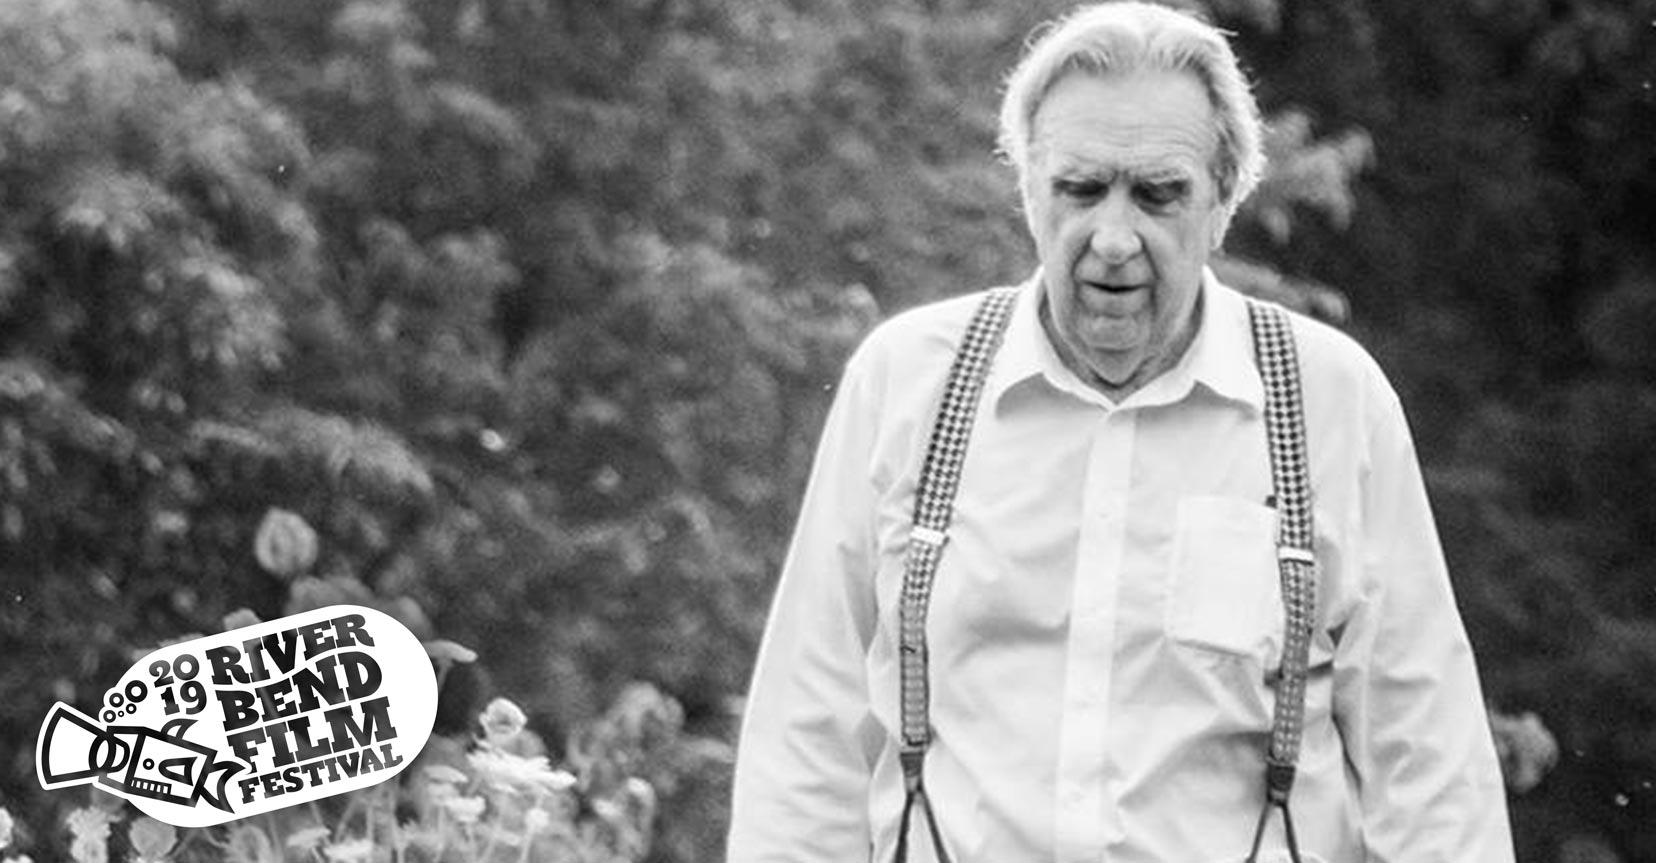 Talkback: The Art of Filmmaking • A Conversation with John Hancock